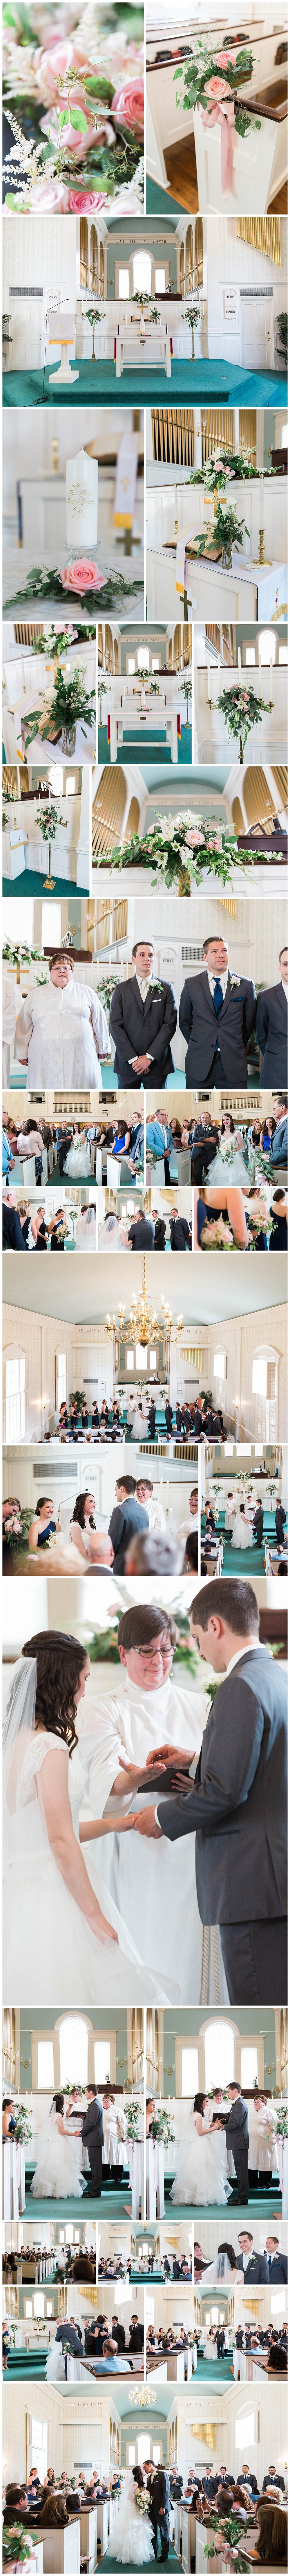 Cleveland-Wedding-Photographer_0018.jpg